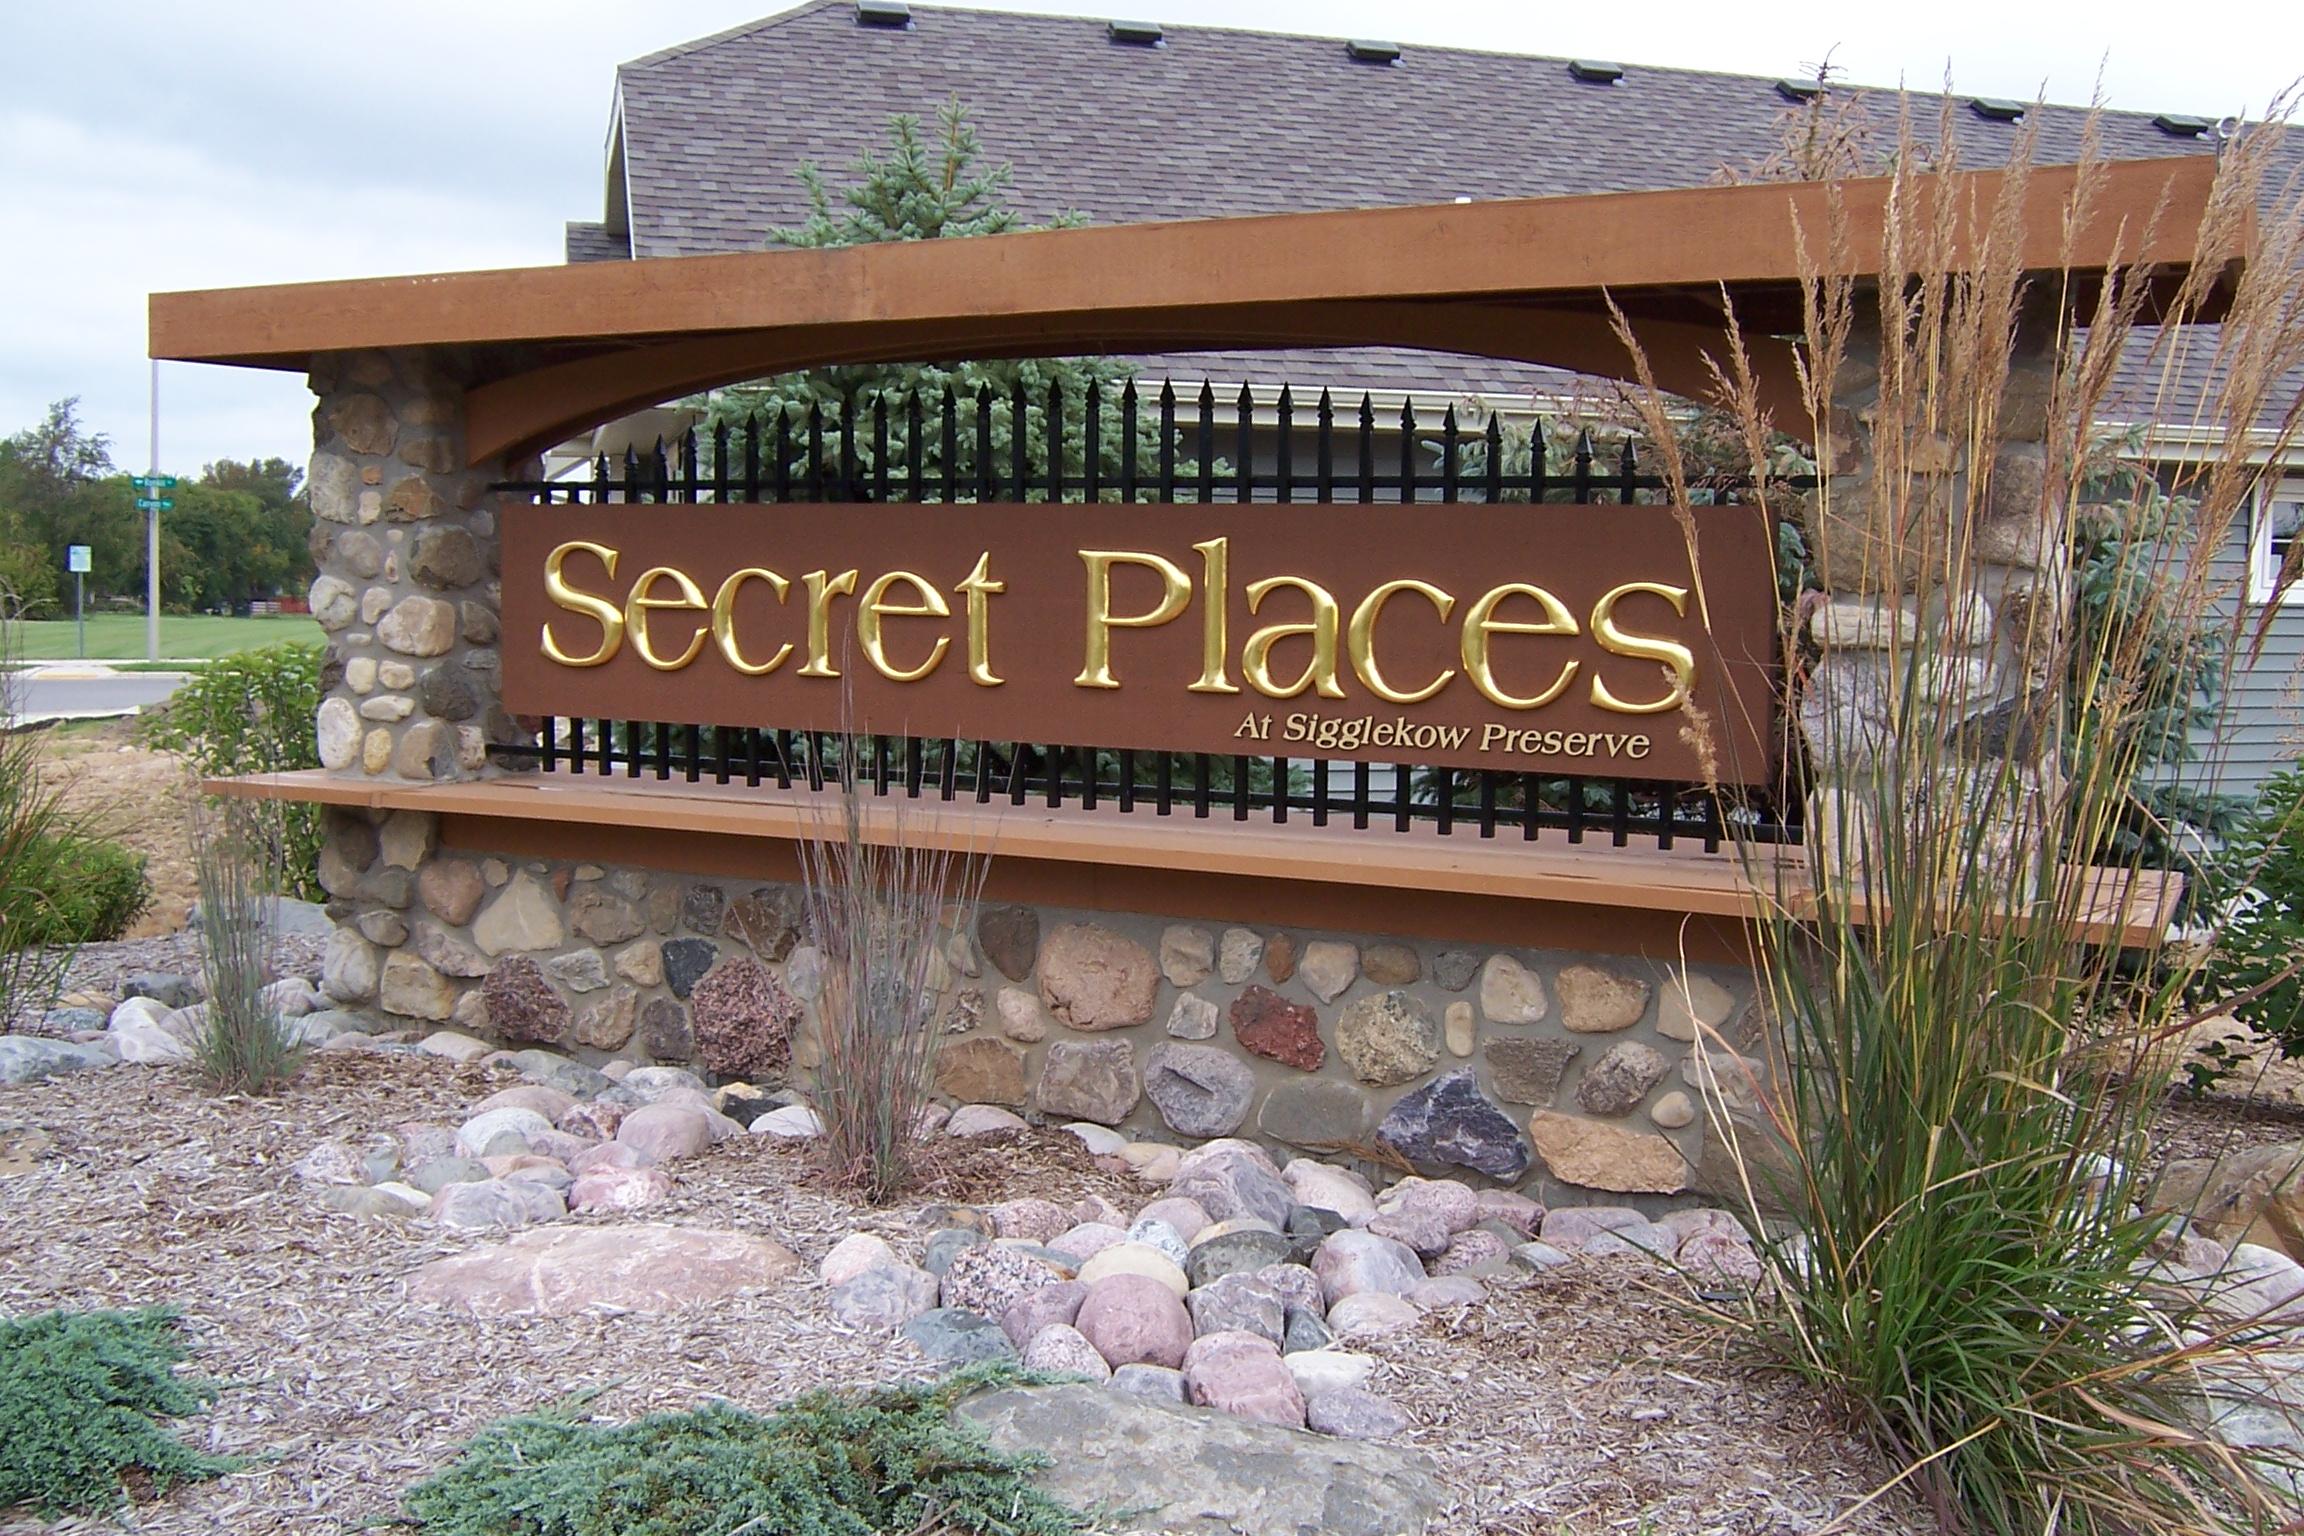 Neighborhood_secret_places.JPG